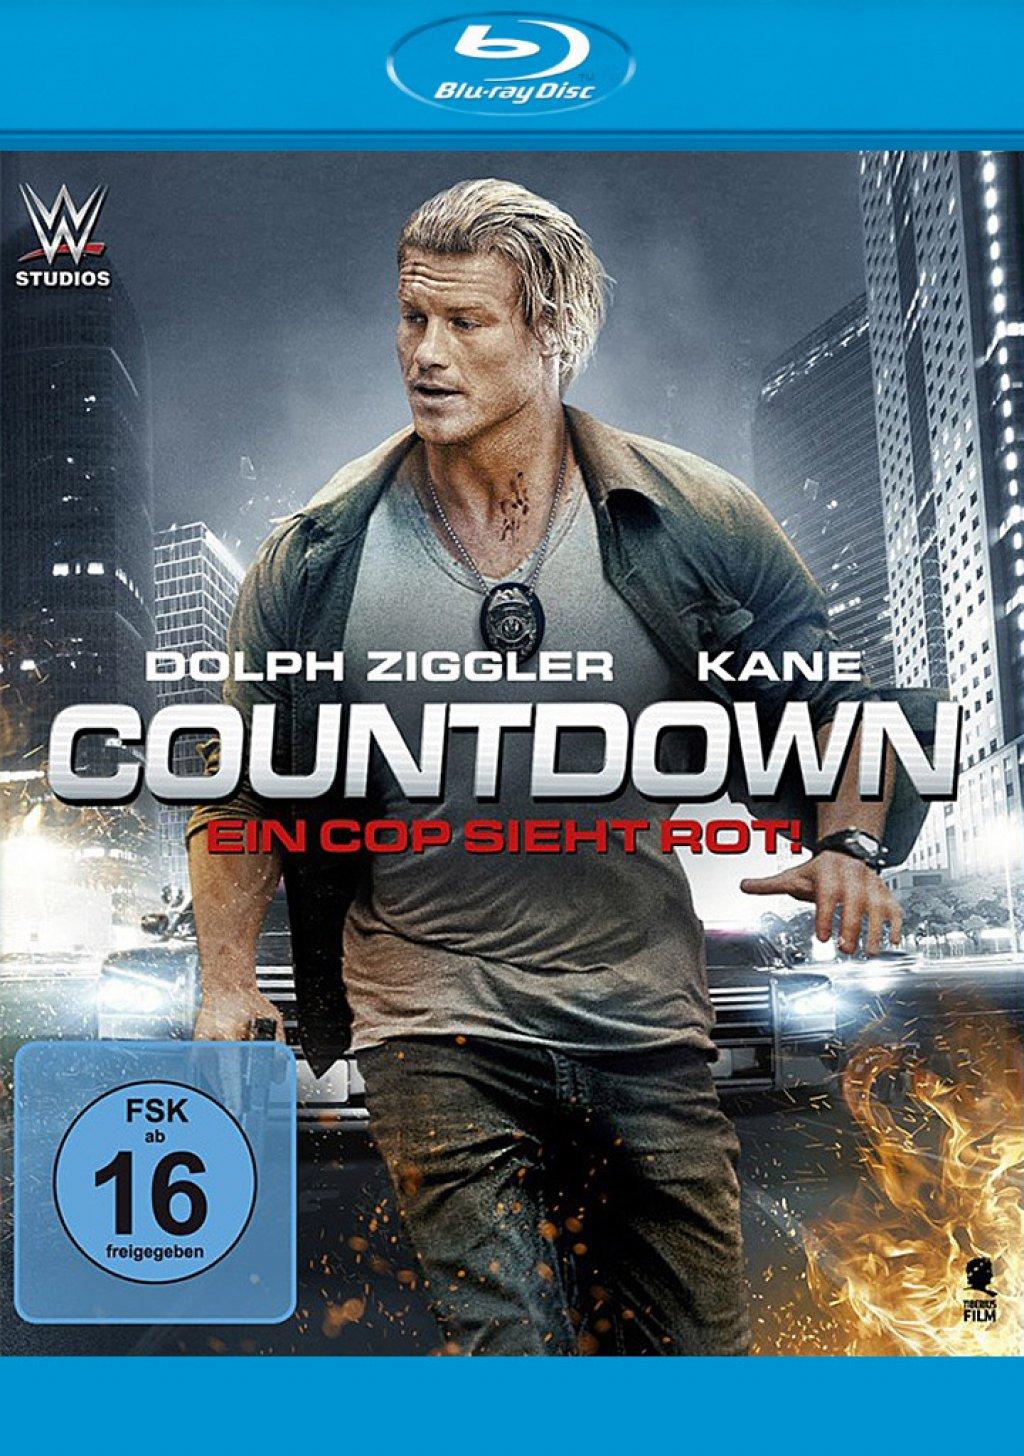 Countdown - Ein Cop sieht rot! (Blu-ray)